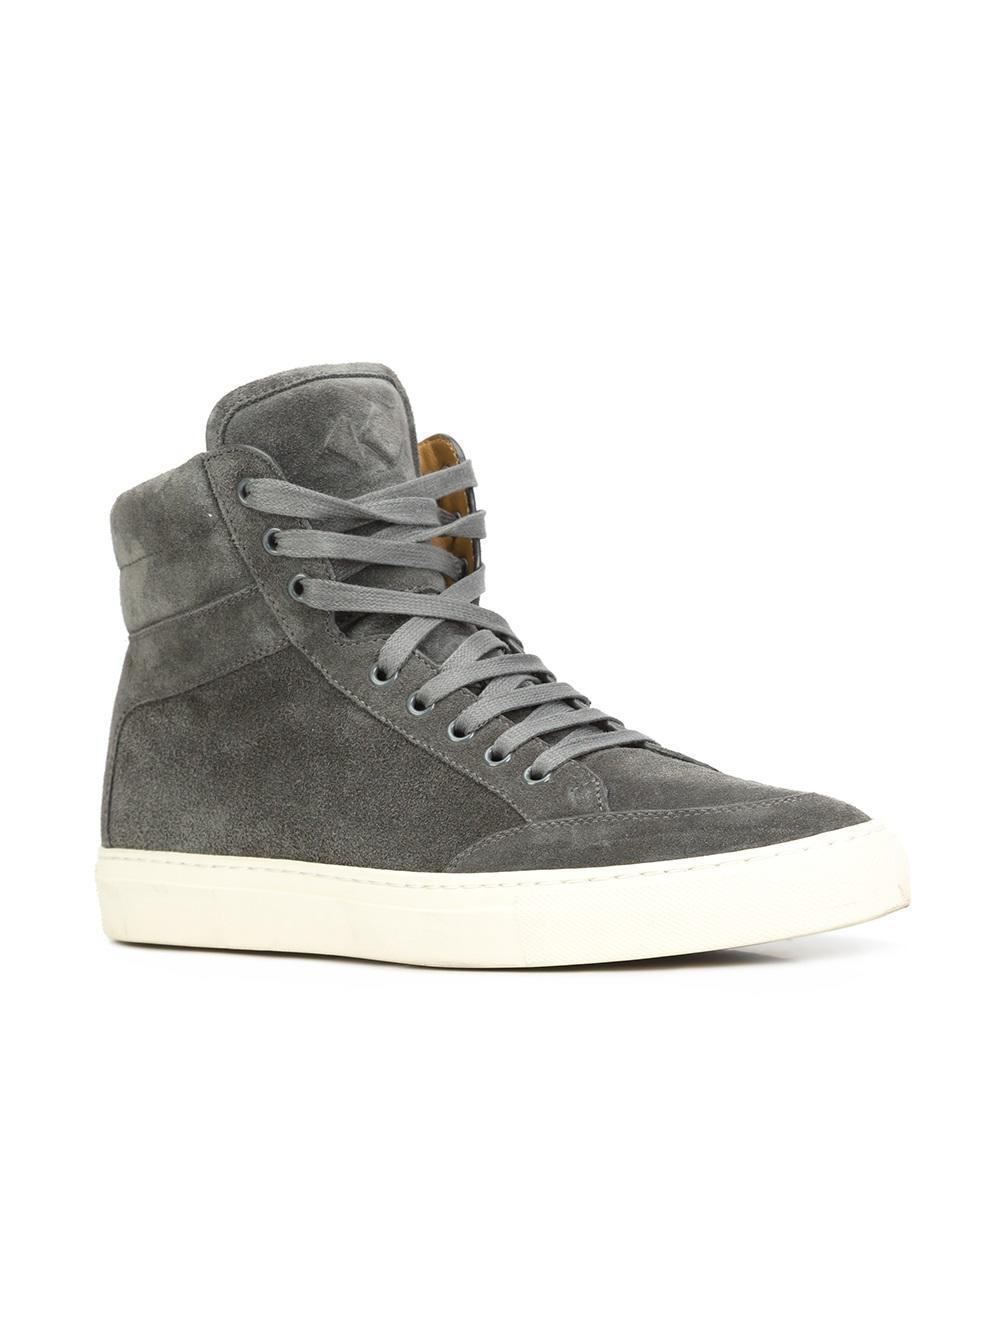 Primo Roccia hi-top sneakers - Grey KOIO bMa6o4HCQ5